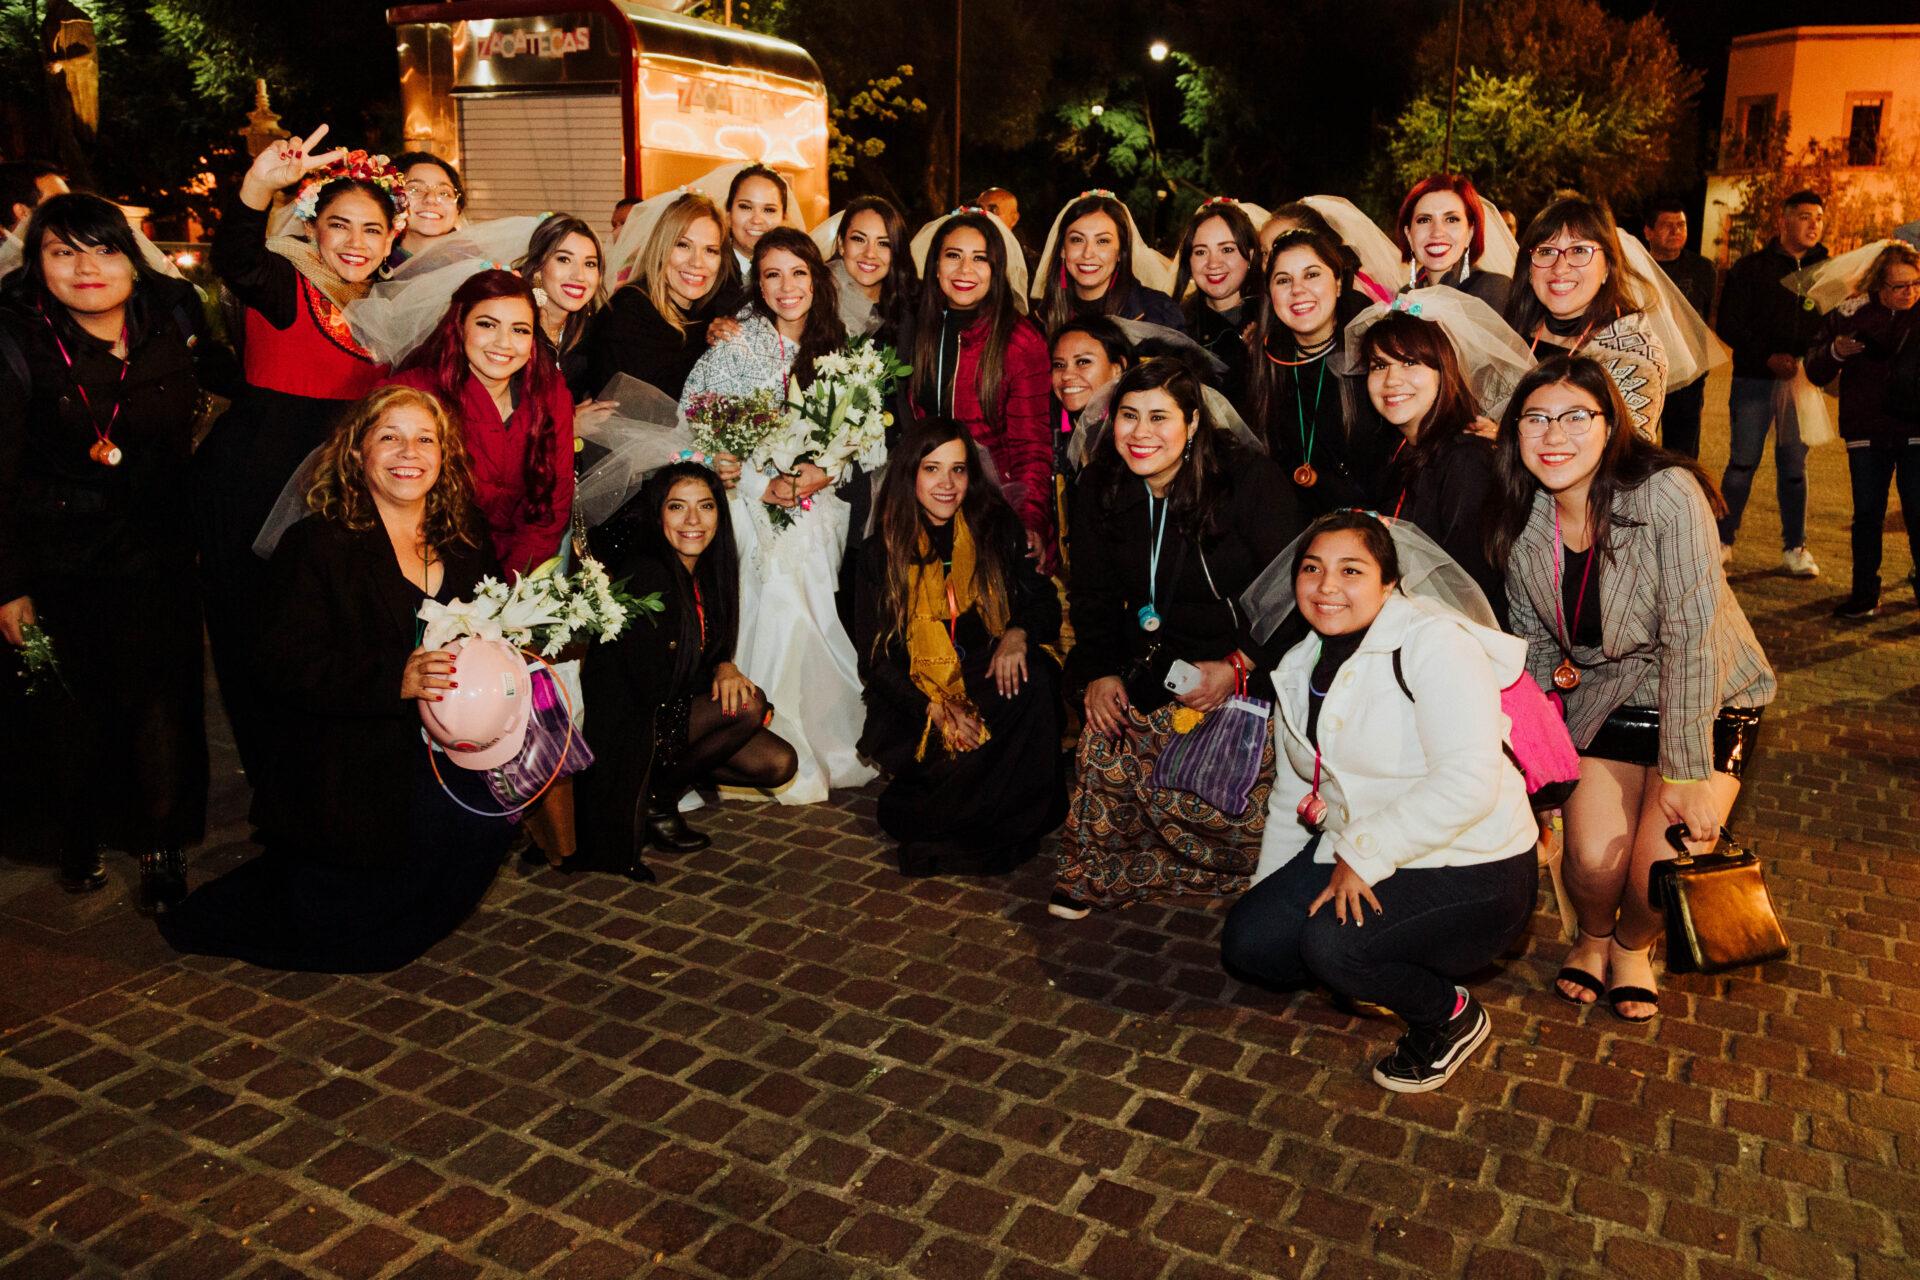 javier_noriega_fotografo_bodas_la_mina_club_zacatecas_wedding_photographer42